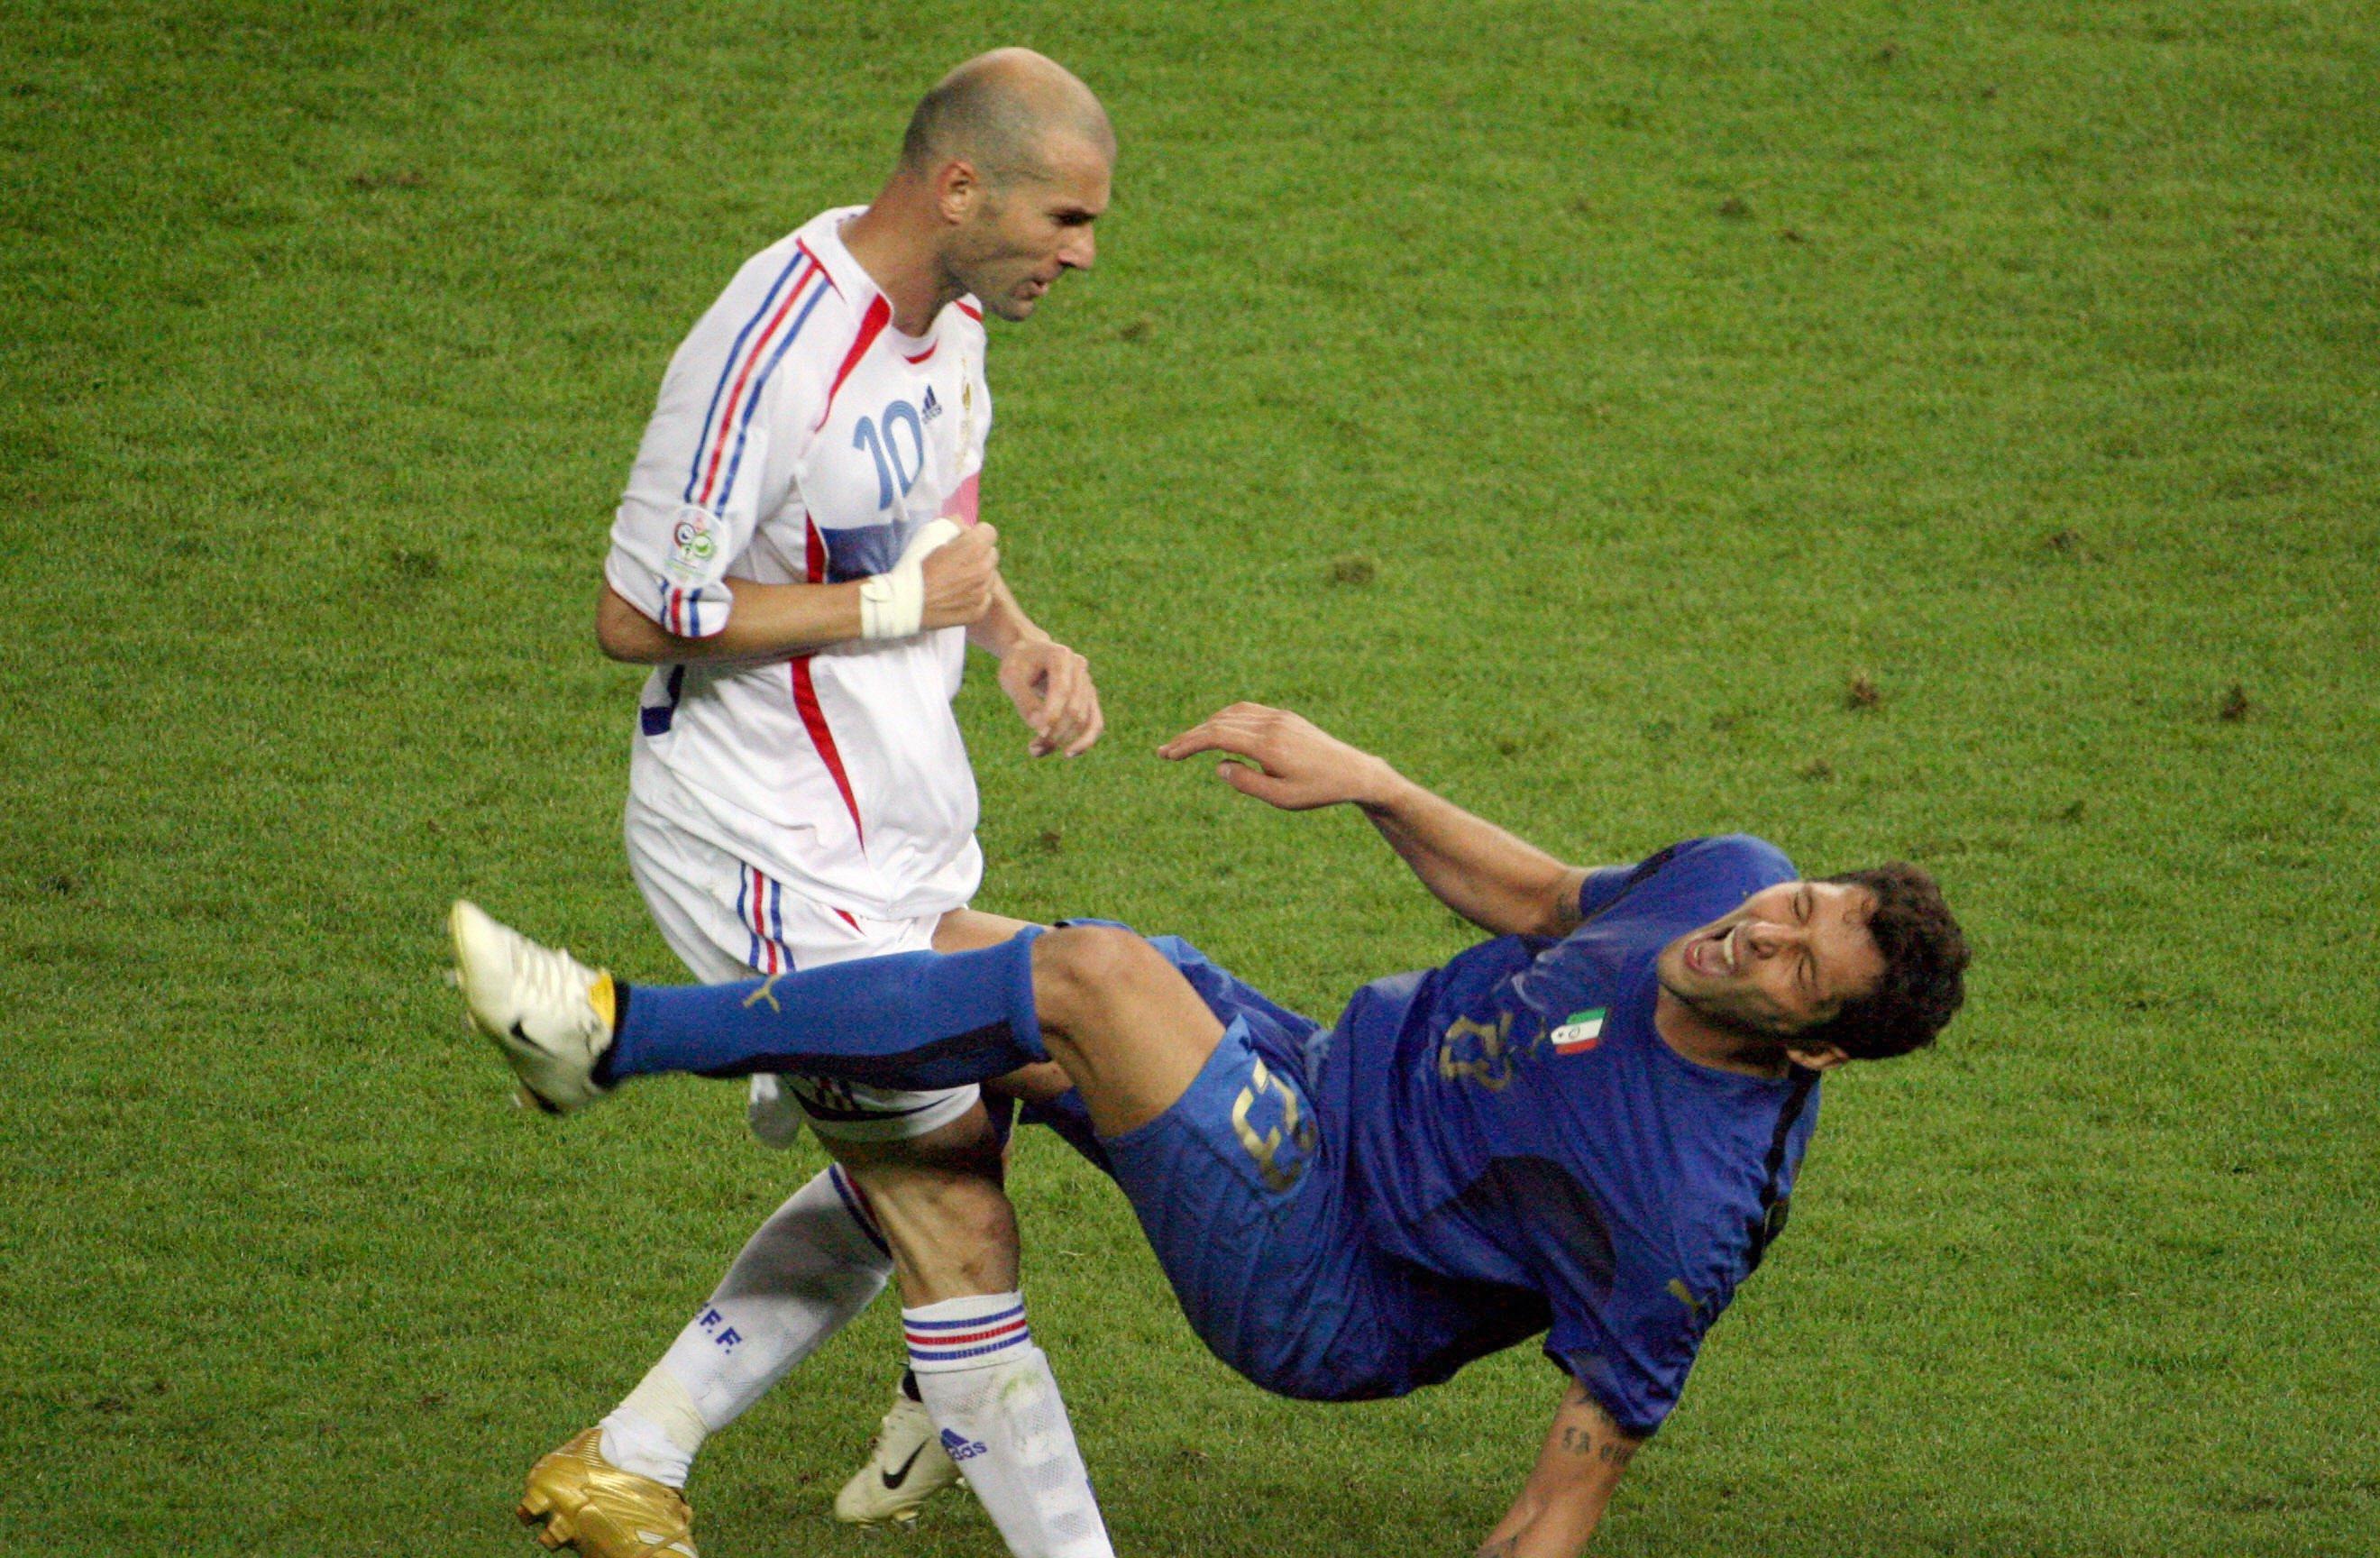 French midfielder Zinedine Zidane (L) gesturing after head-butting Italian defender Marco Materazzi